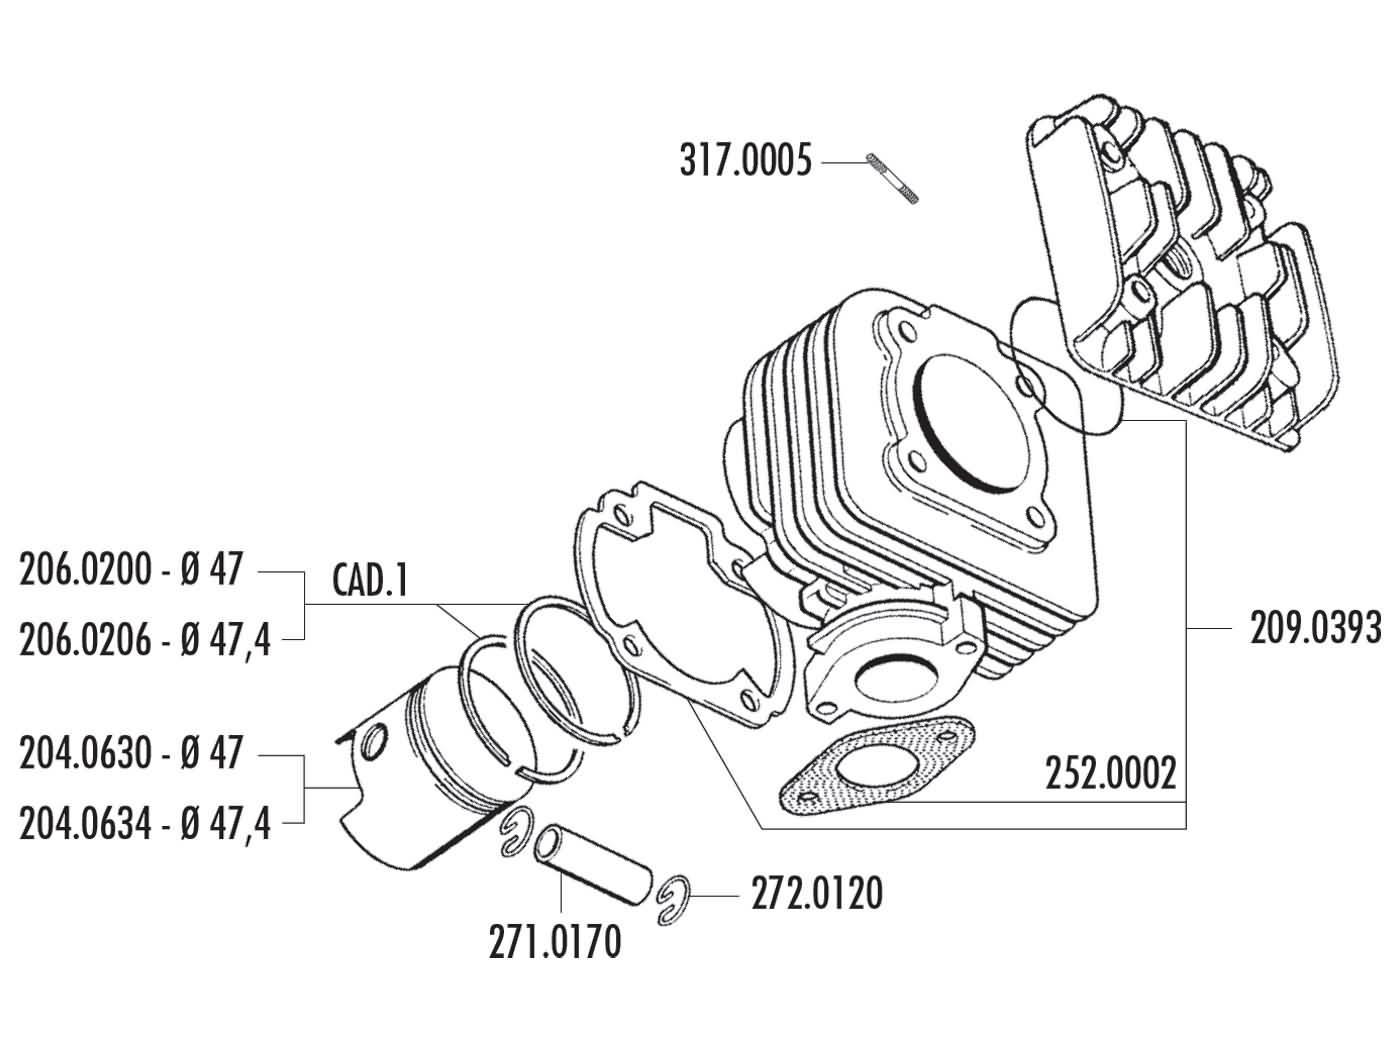 Cylinder Kit Polini Cast Iron Sport 70cc For Morini Ac Scooter Engine Diagram